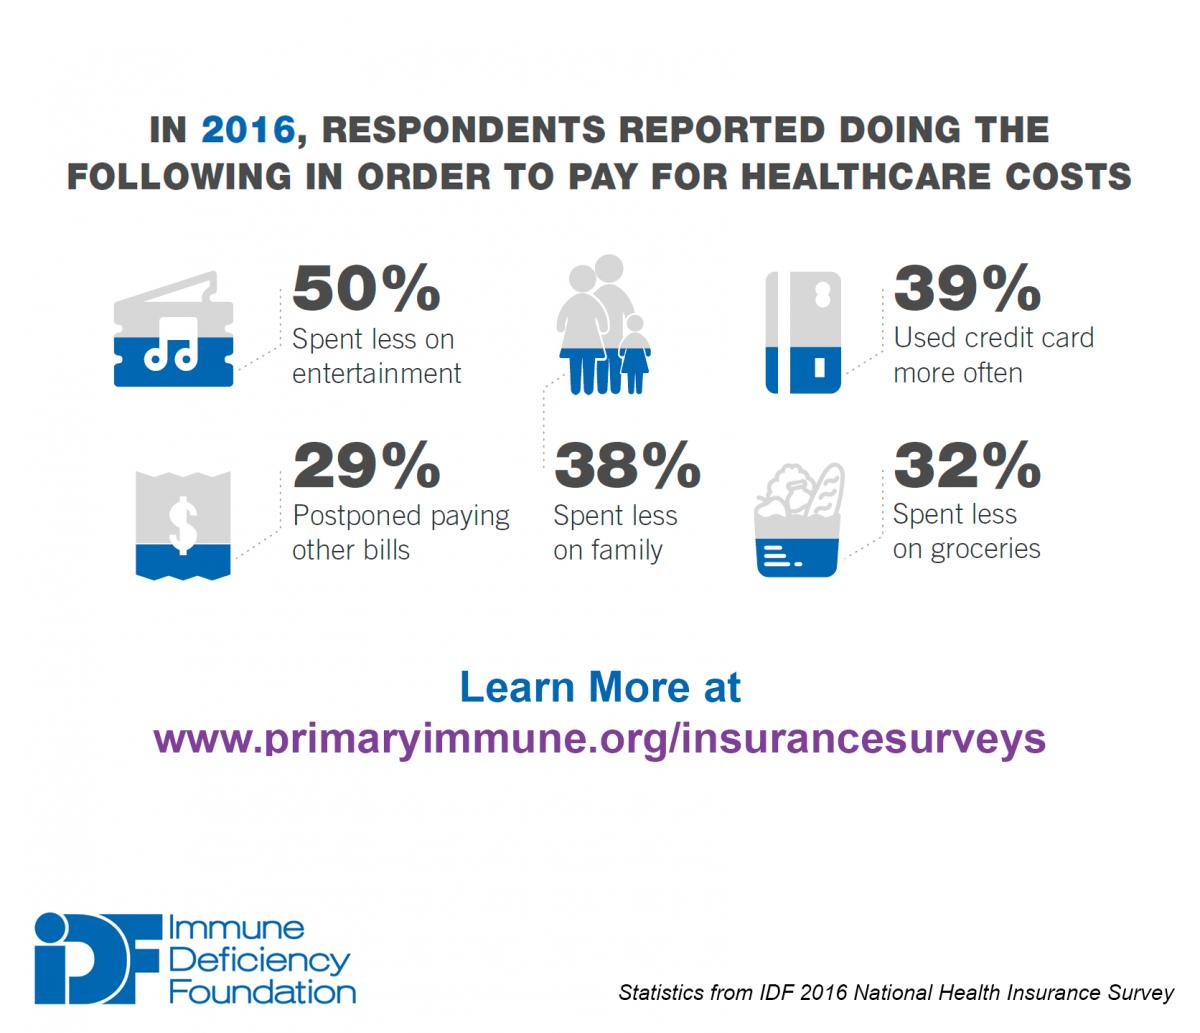 Idf National Health Insurance Surveys Immune Deficiency Foundation